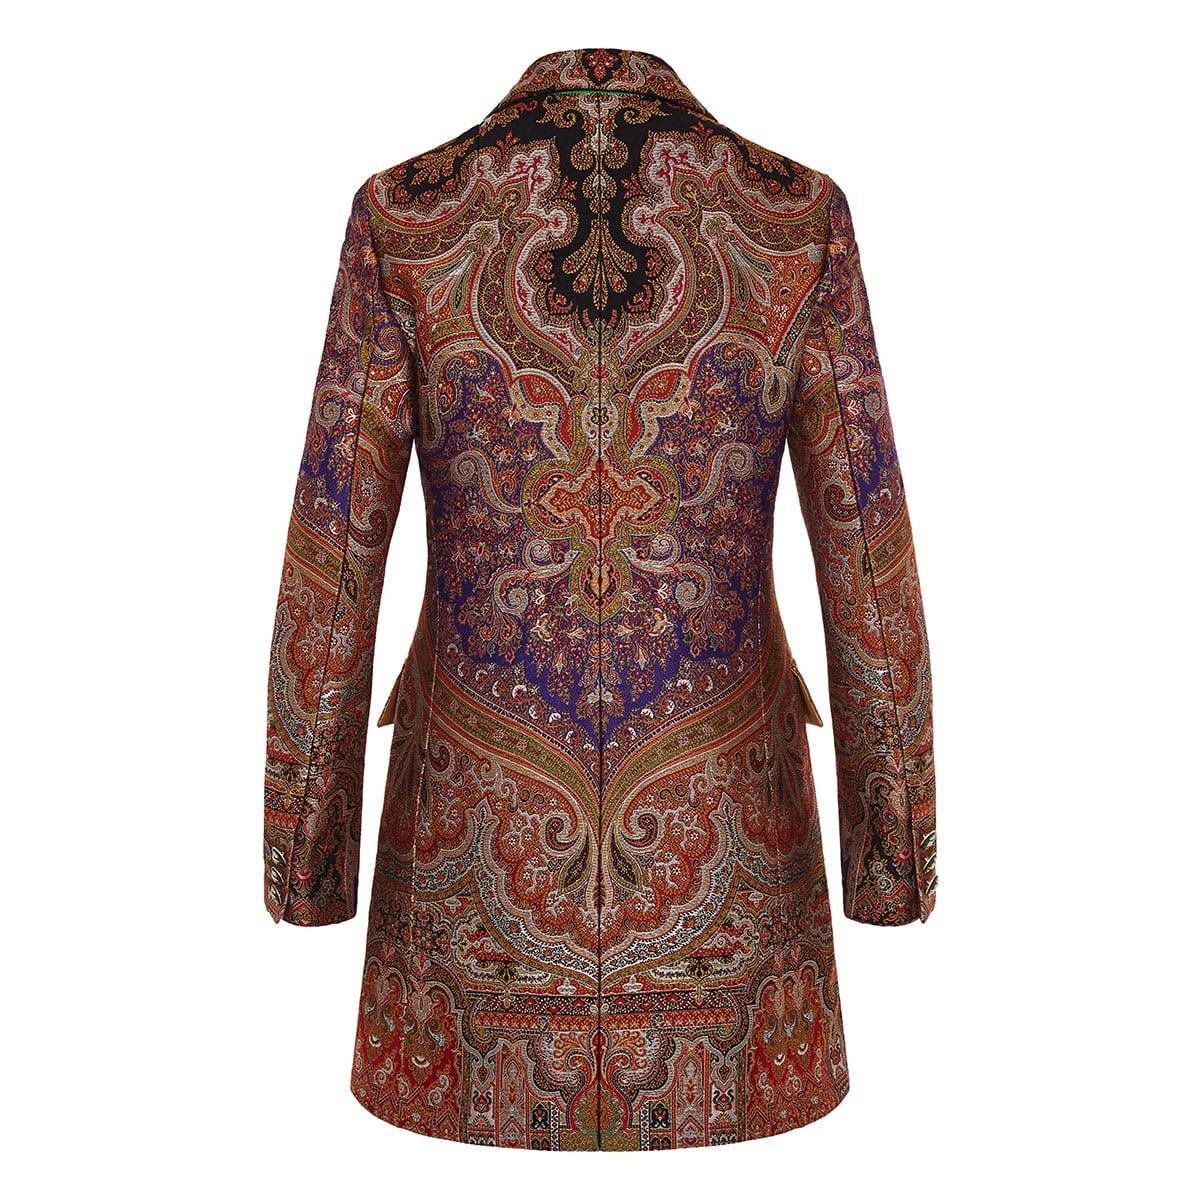 Paisley double-breasted jacquard coat